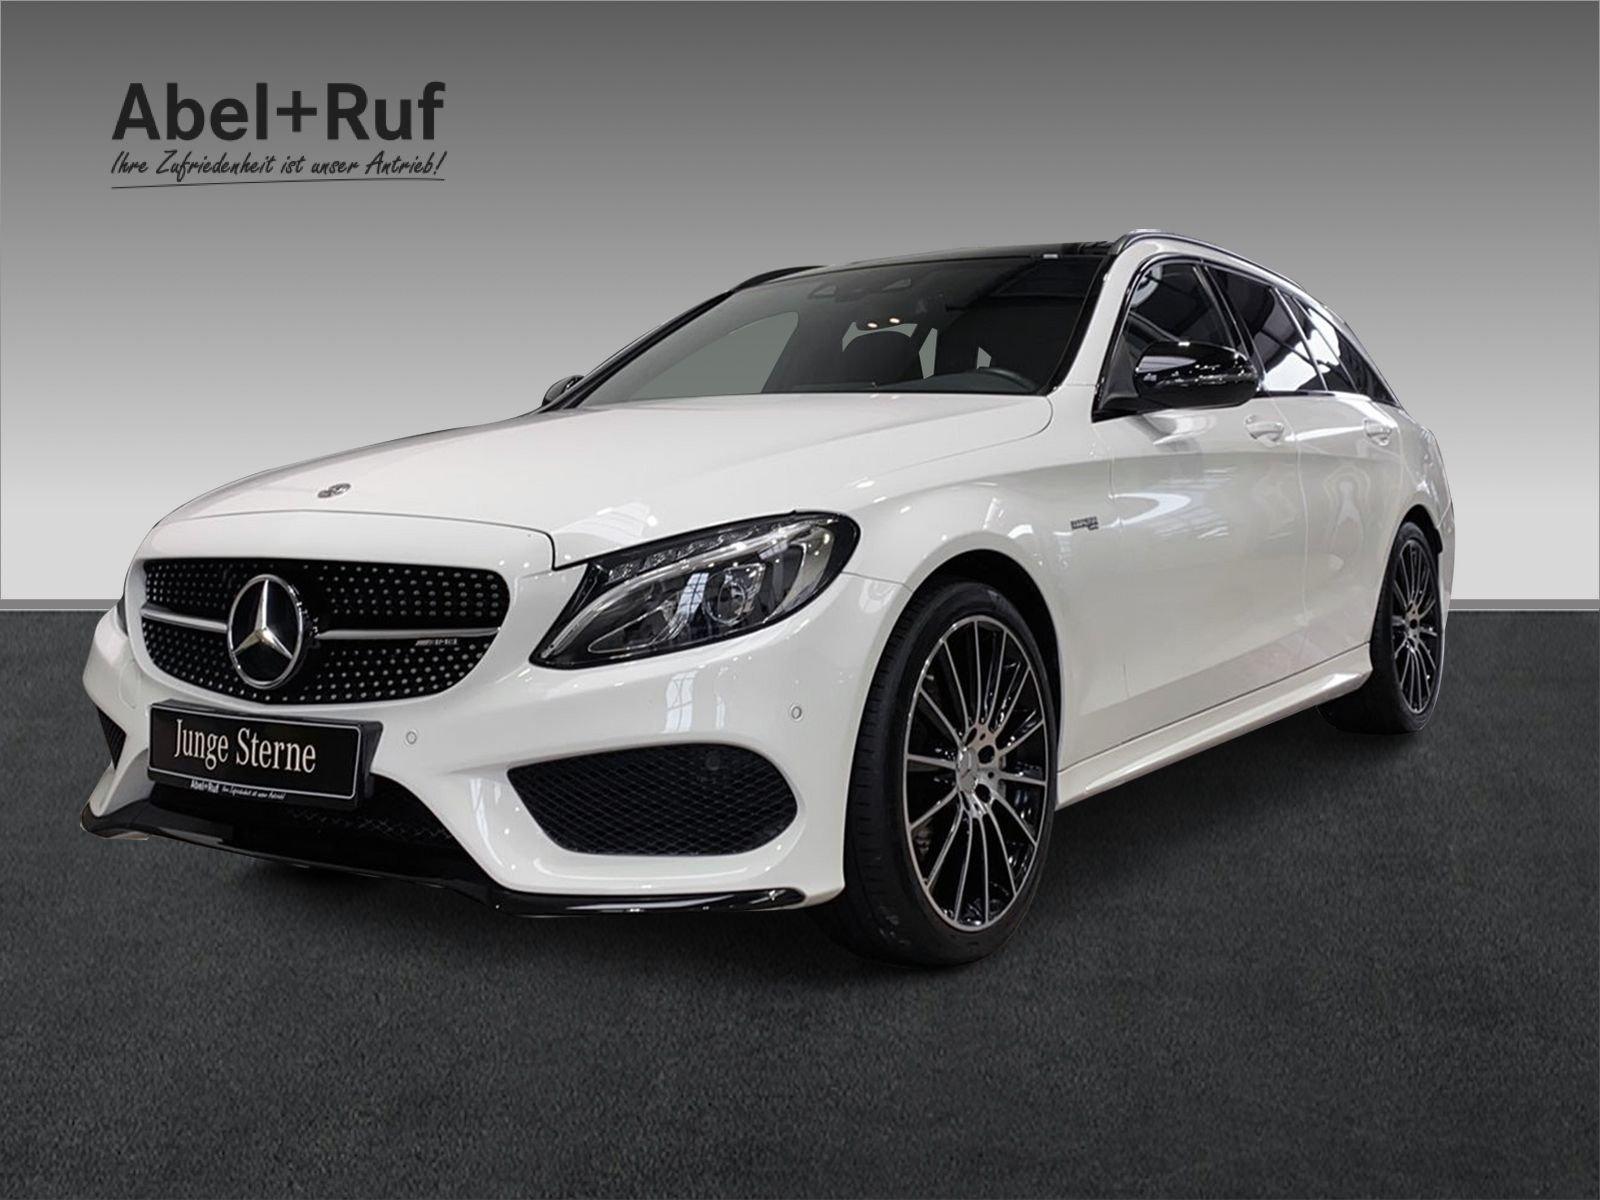 Mercedes-Benz C 43 AMG 4MATIC T-Modell+PANO+AHK+COMAND+HUD+LED, Jahr 2018, Benzin